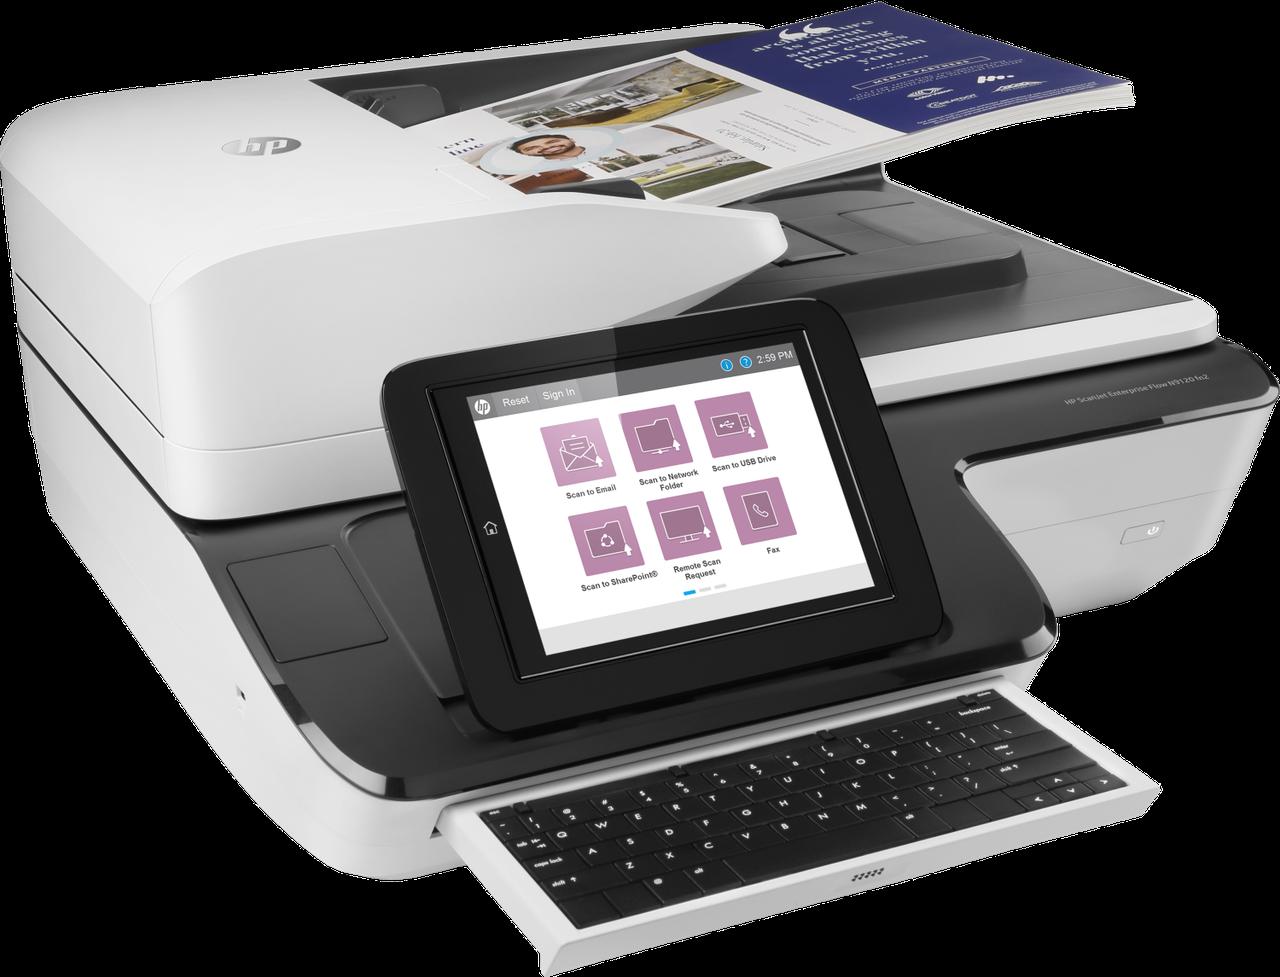 Сканер HP Cканер HP L2763A ScanJet Enterprise Flow N9120 fn2 (A3) 600 dpi, 24 bit, ADF (200 pages), 120/120